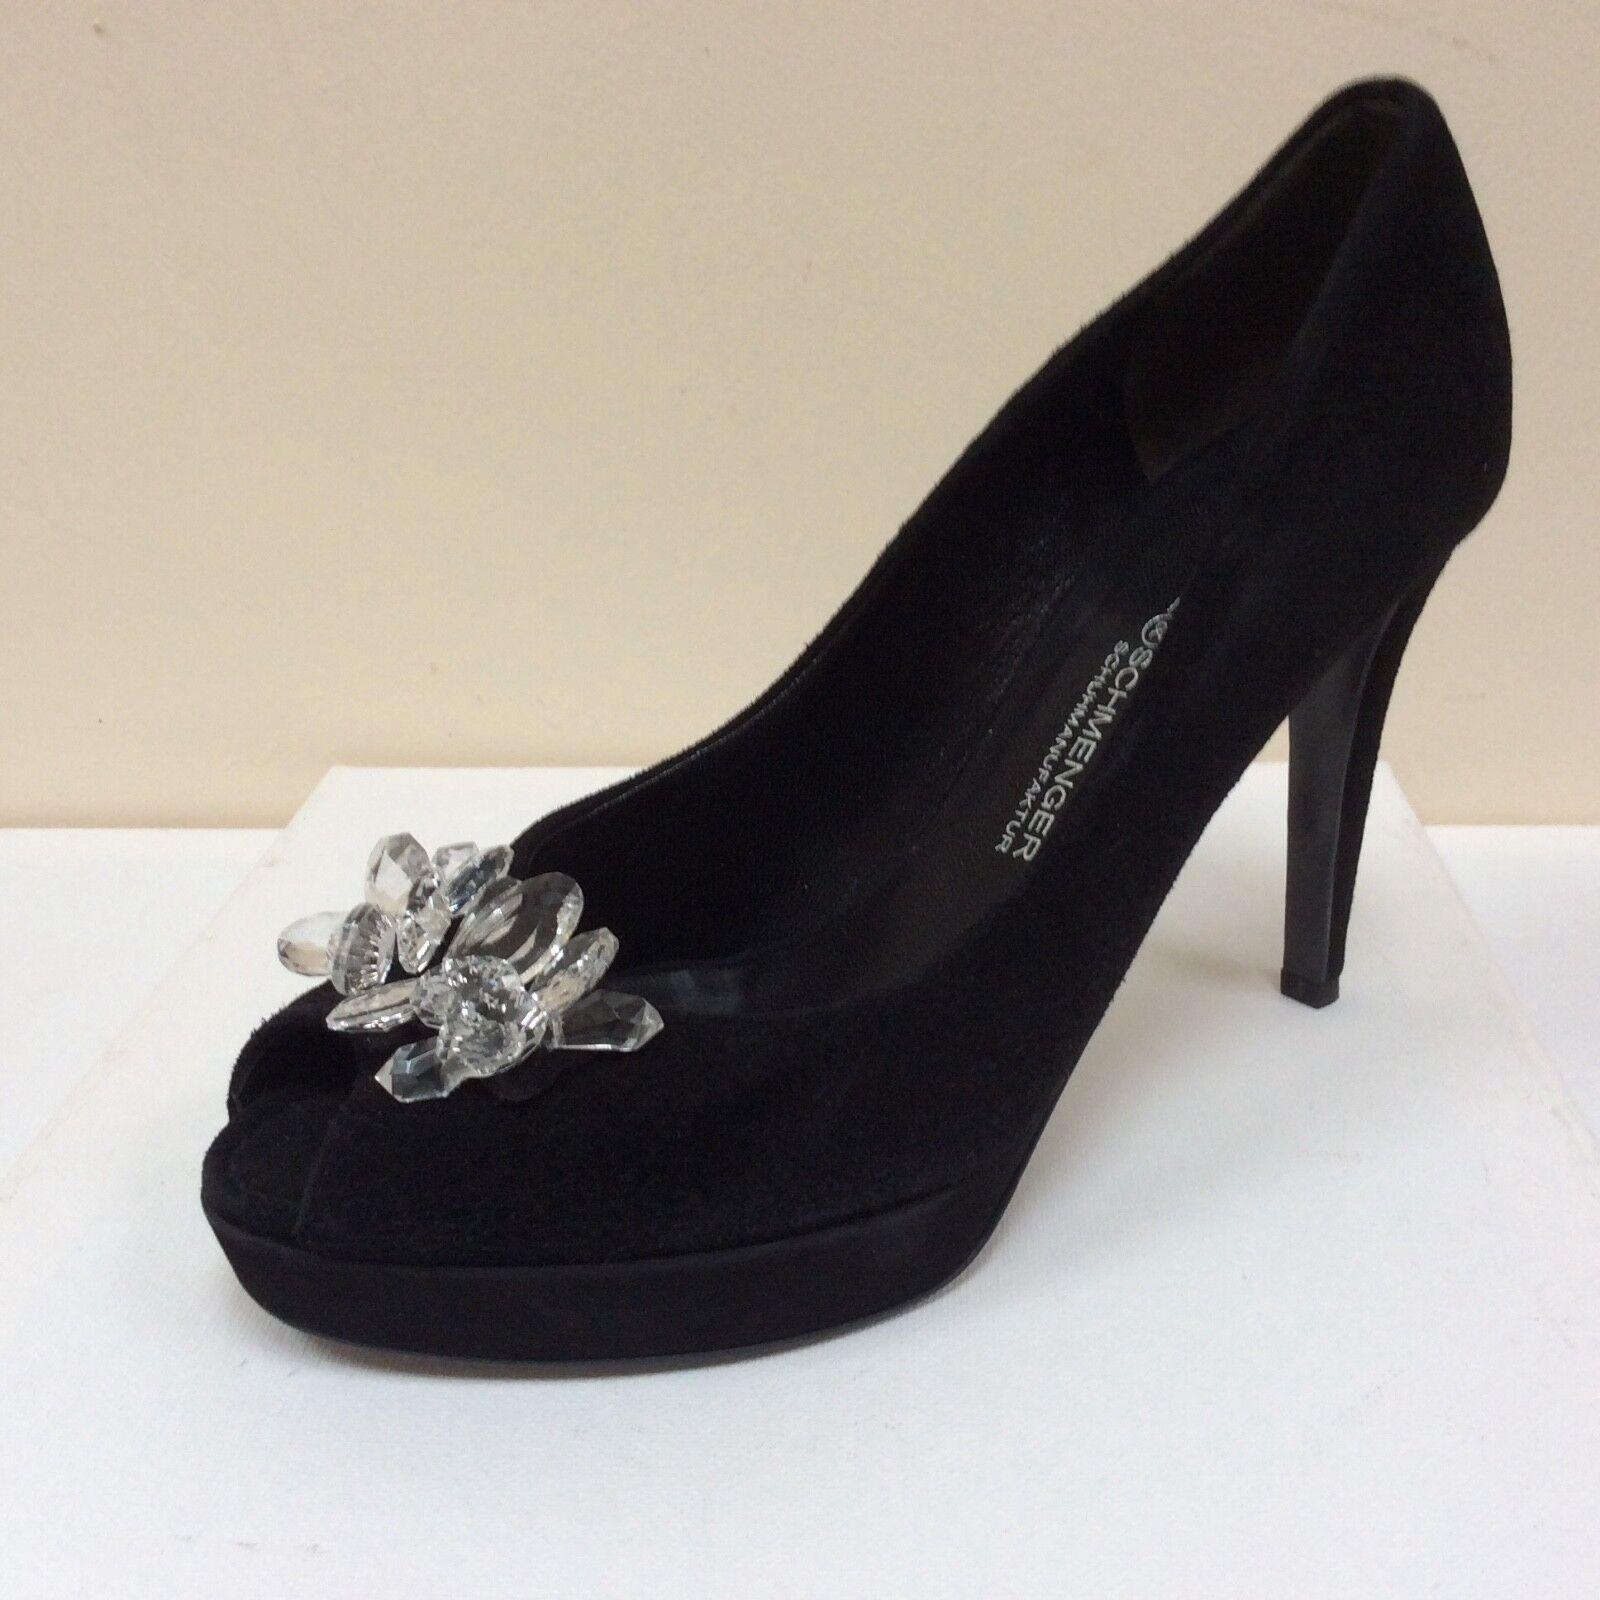 K&S schwarz suede crystal embellished peep toe courts UK 3.5/EU 36.5   BNWB